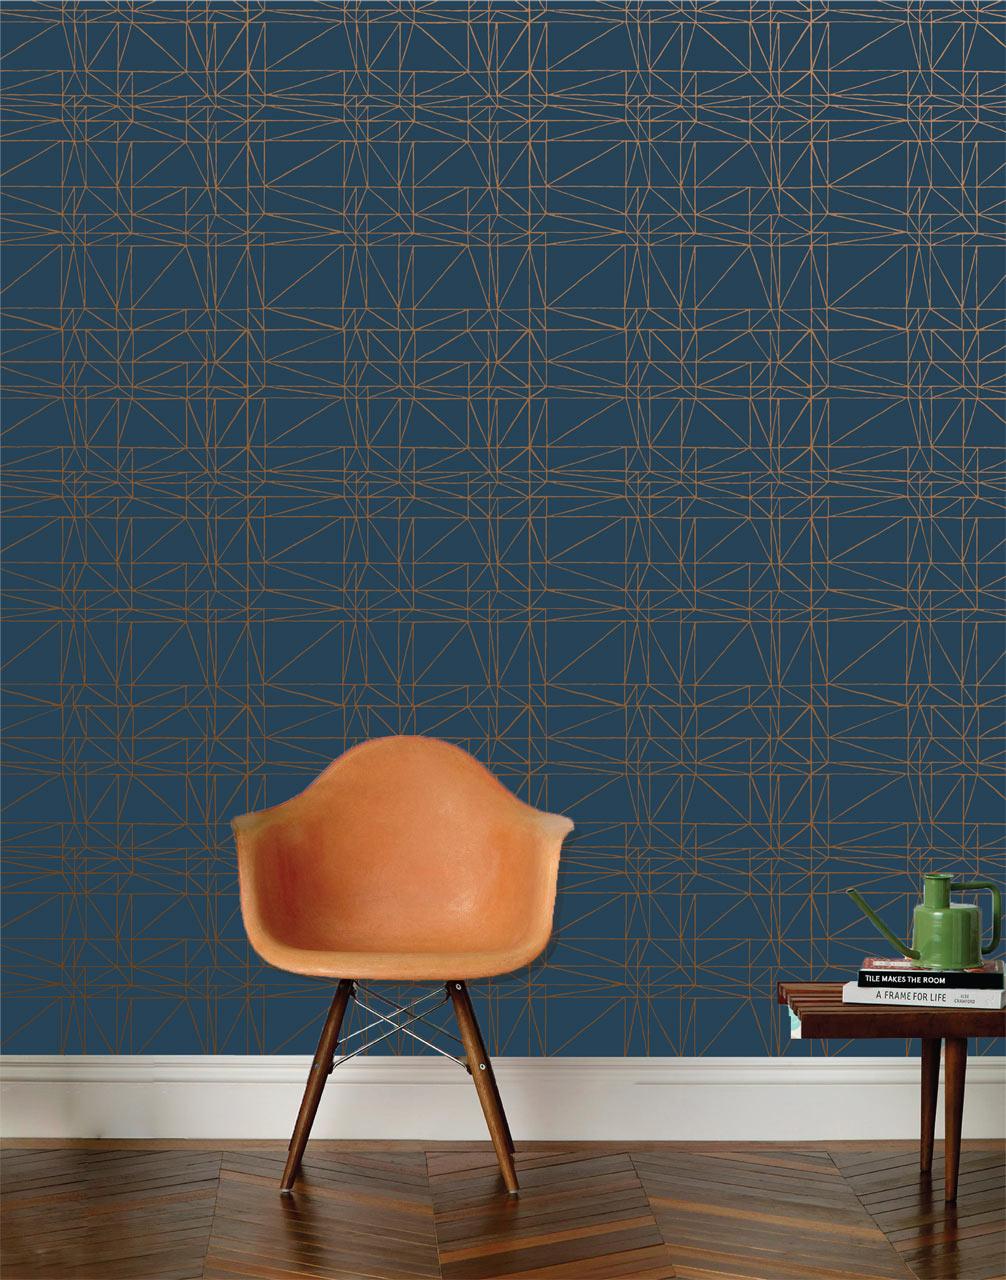 Heath Ceramics Explores the World of Wallpaper